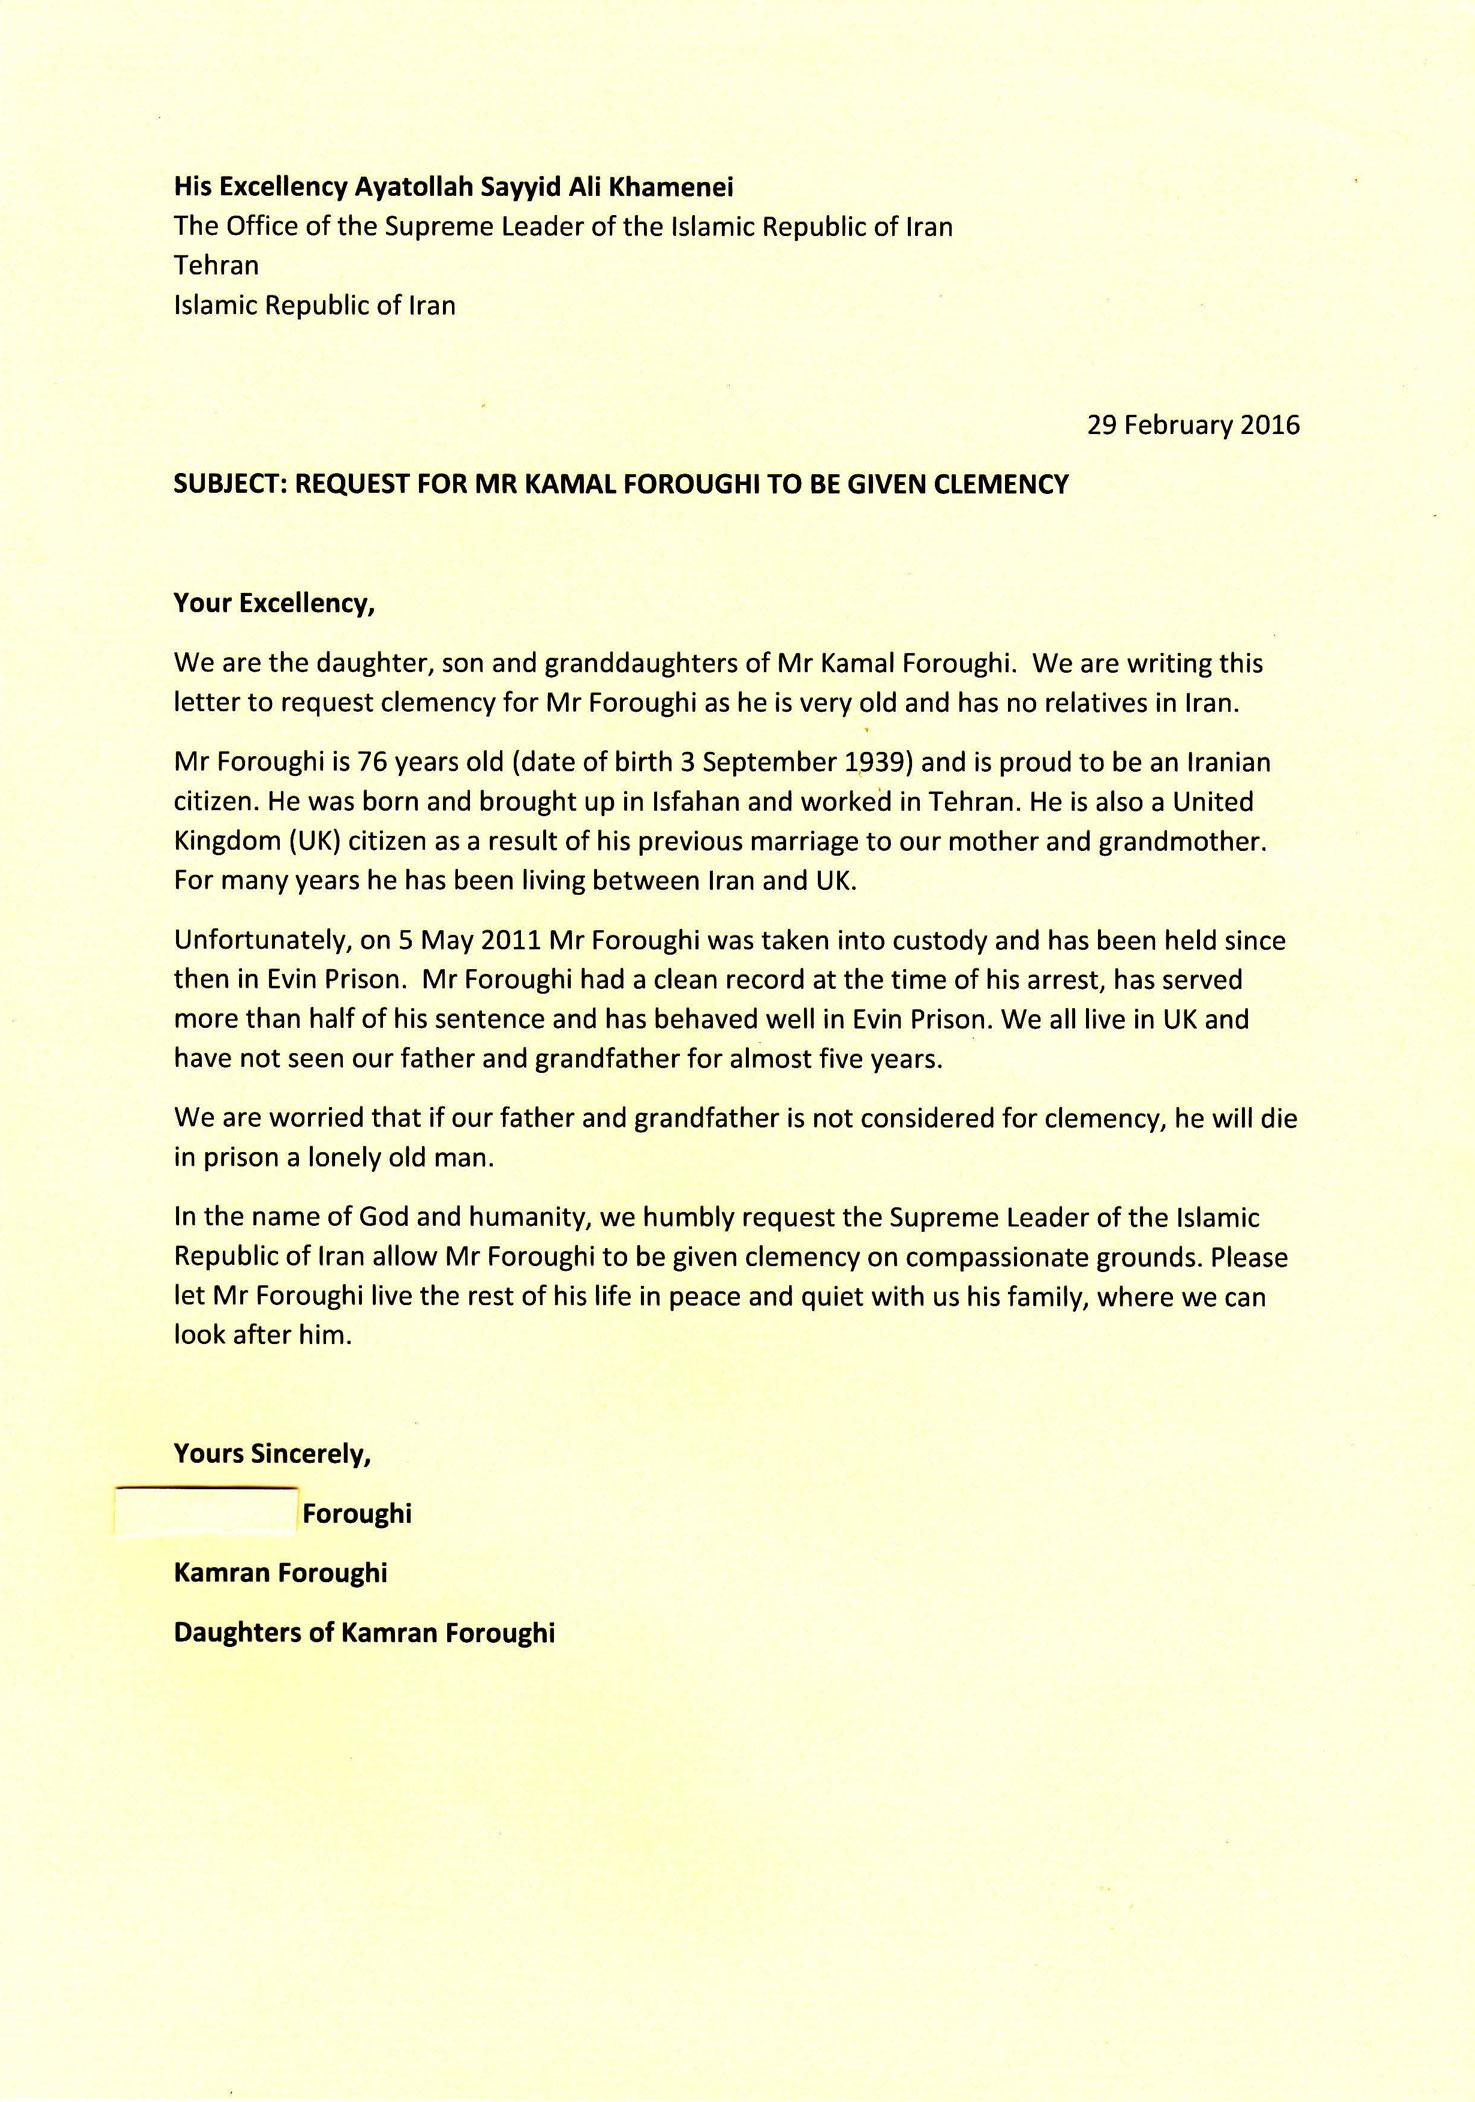 Letter to Iran Supreme Leader – Free Kamal Foroughi